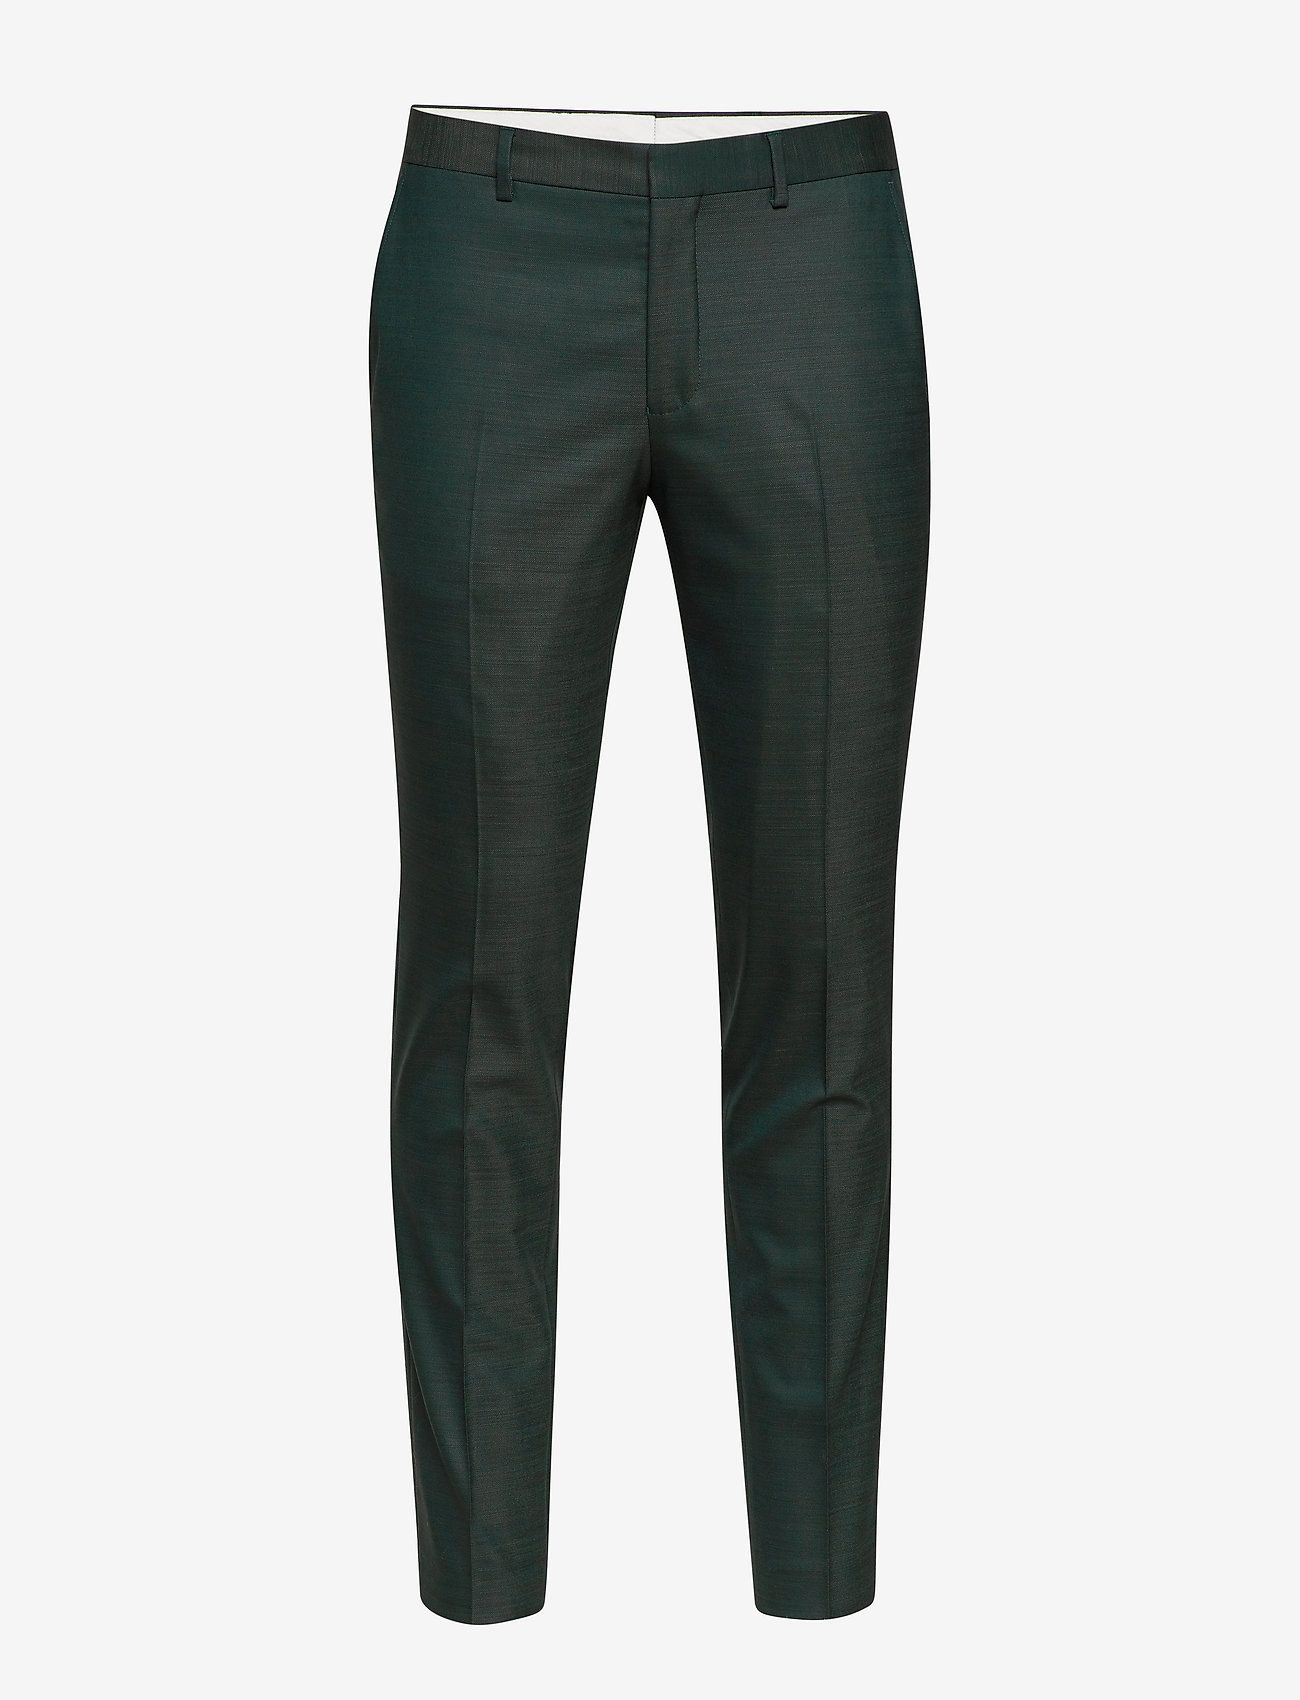 Selected Homme - SLHSLIM-MYLOSTATE FLEX GREEN TRS B - formele broeken - dark green - 0